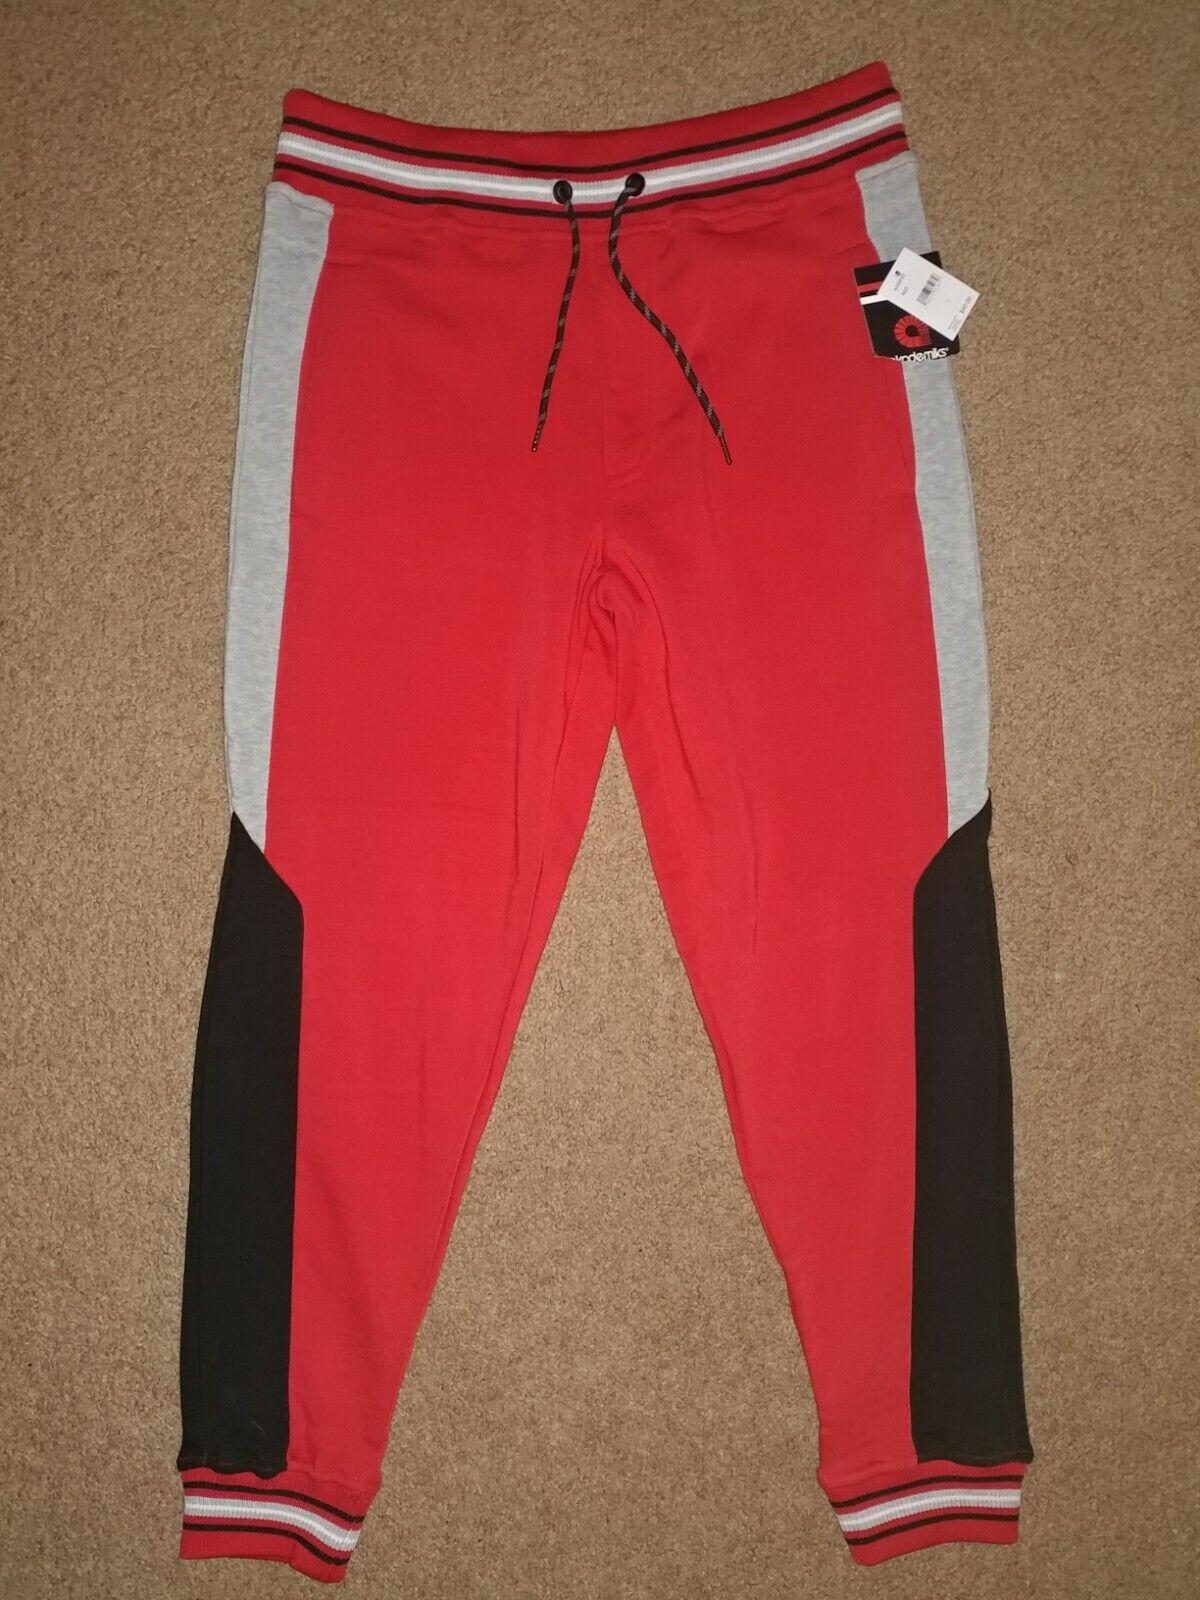 akademiks: Red/Black/Gray Jogger Sweatpants - Men's Size Large - NWT